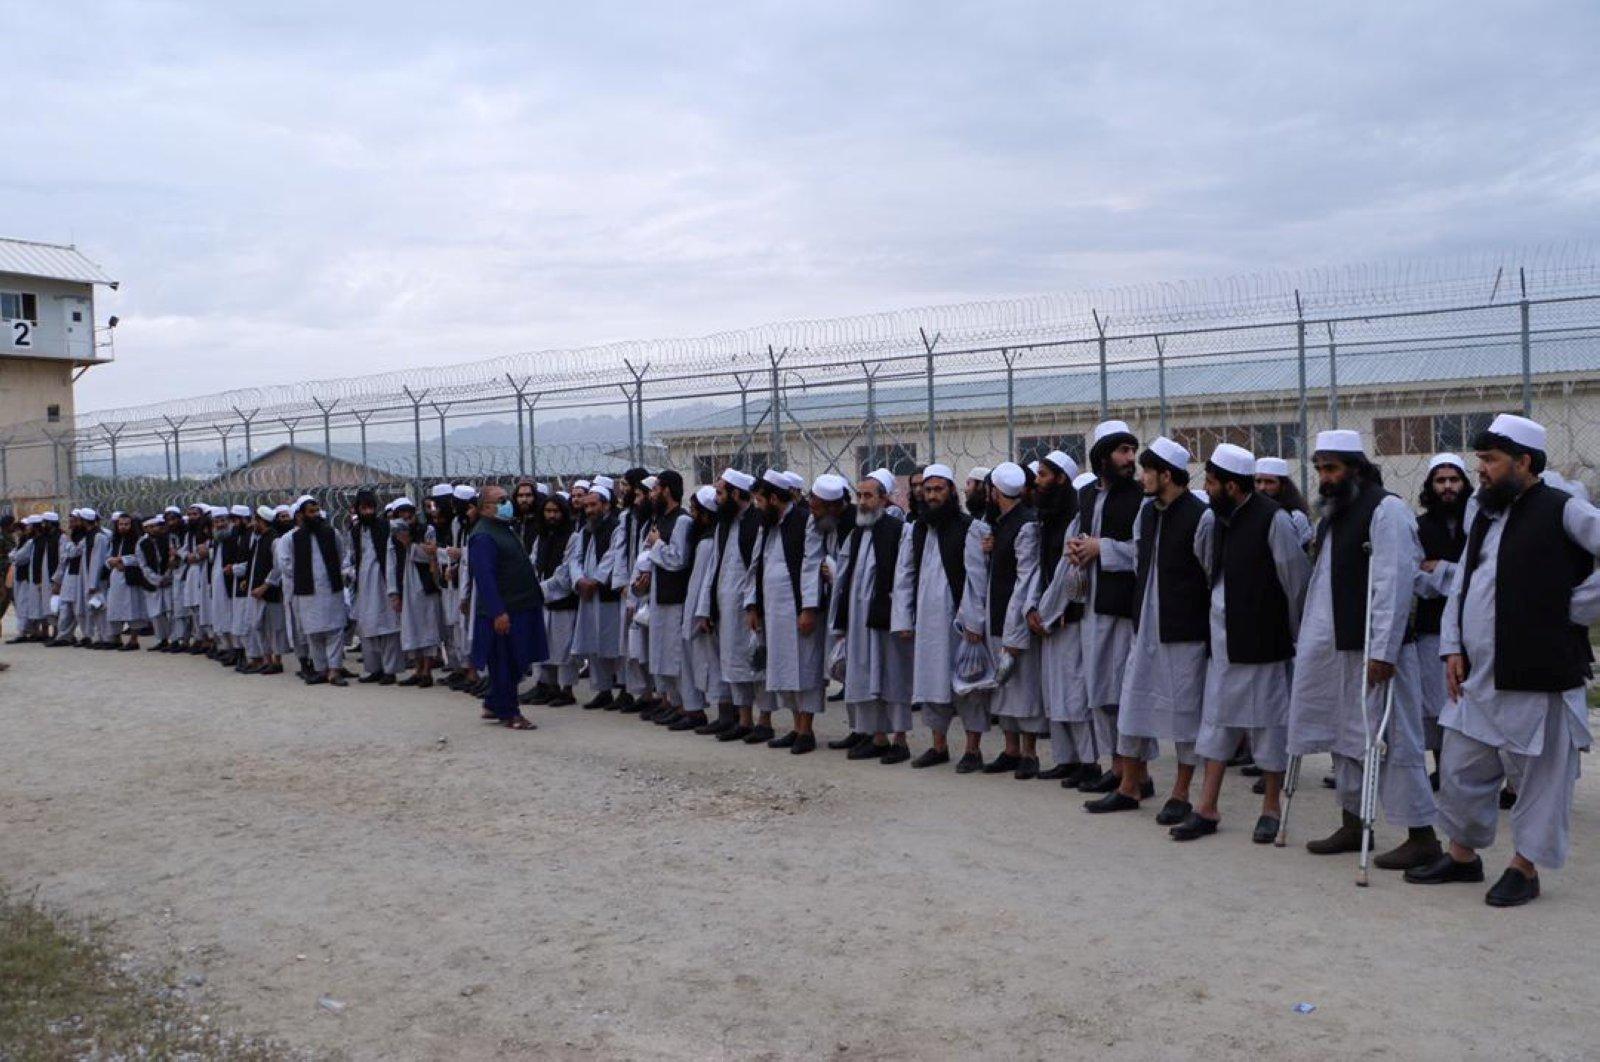 Newly freed Taliban prisoners line up at Bagram prison, Kabul, April 11, 2020. (Reuters Photo)